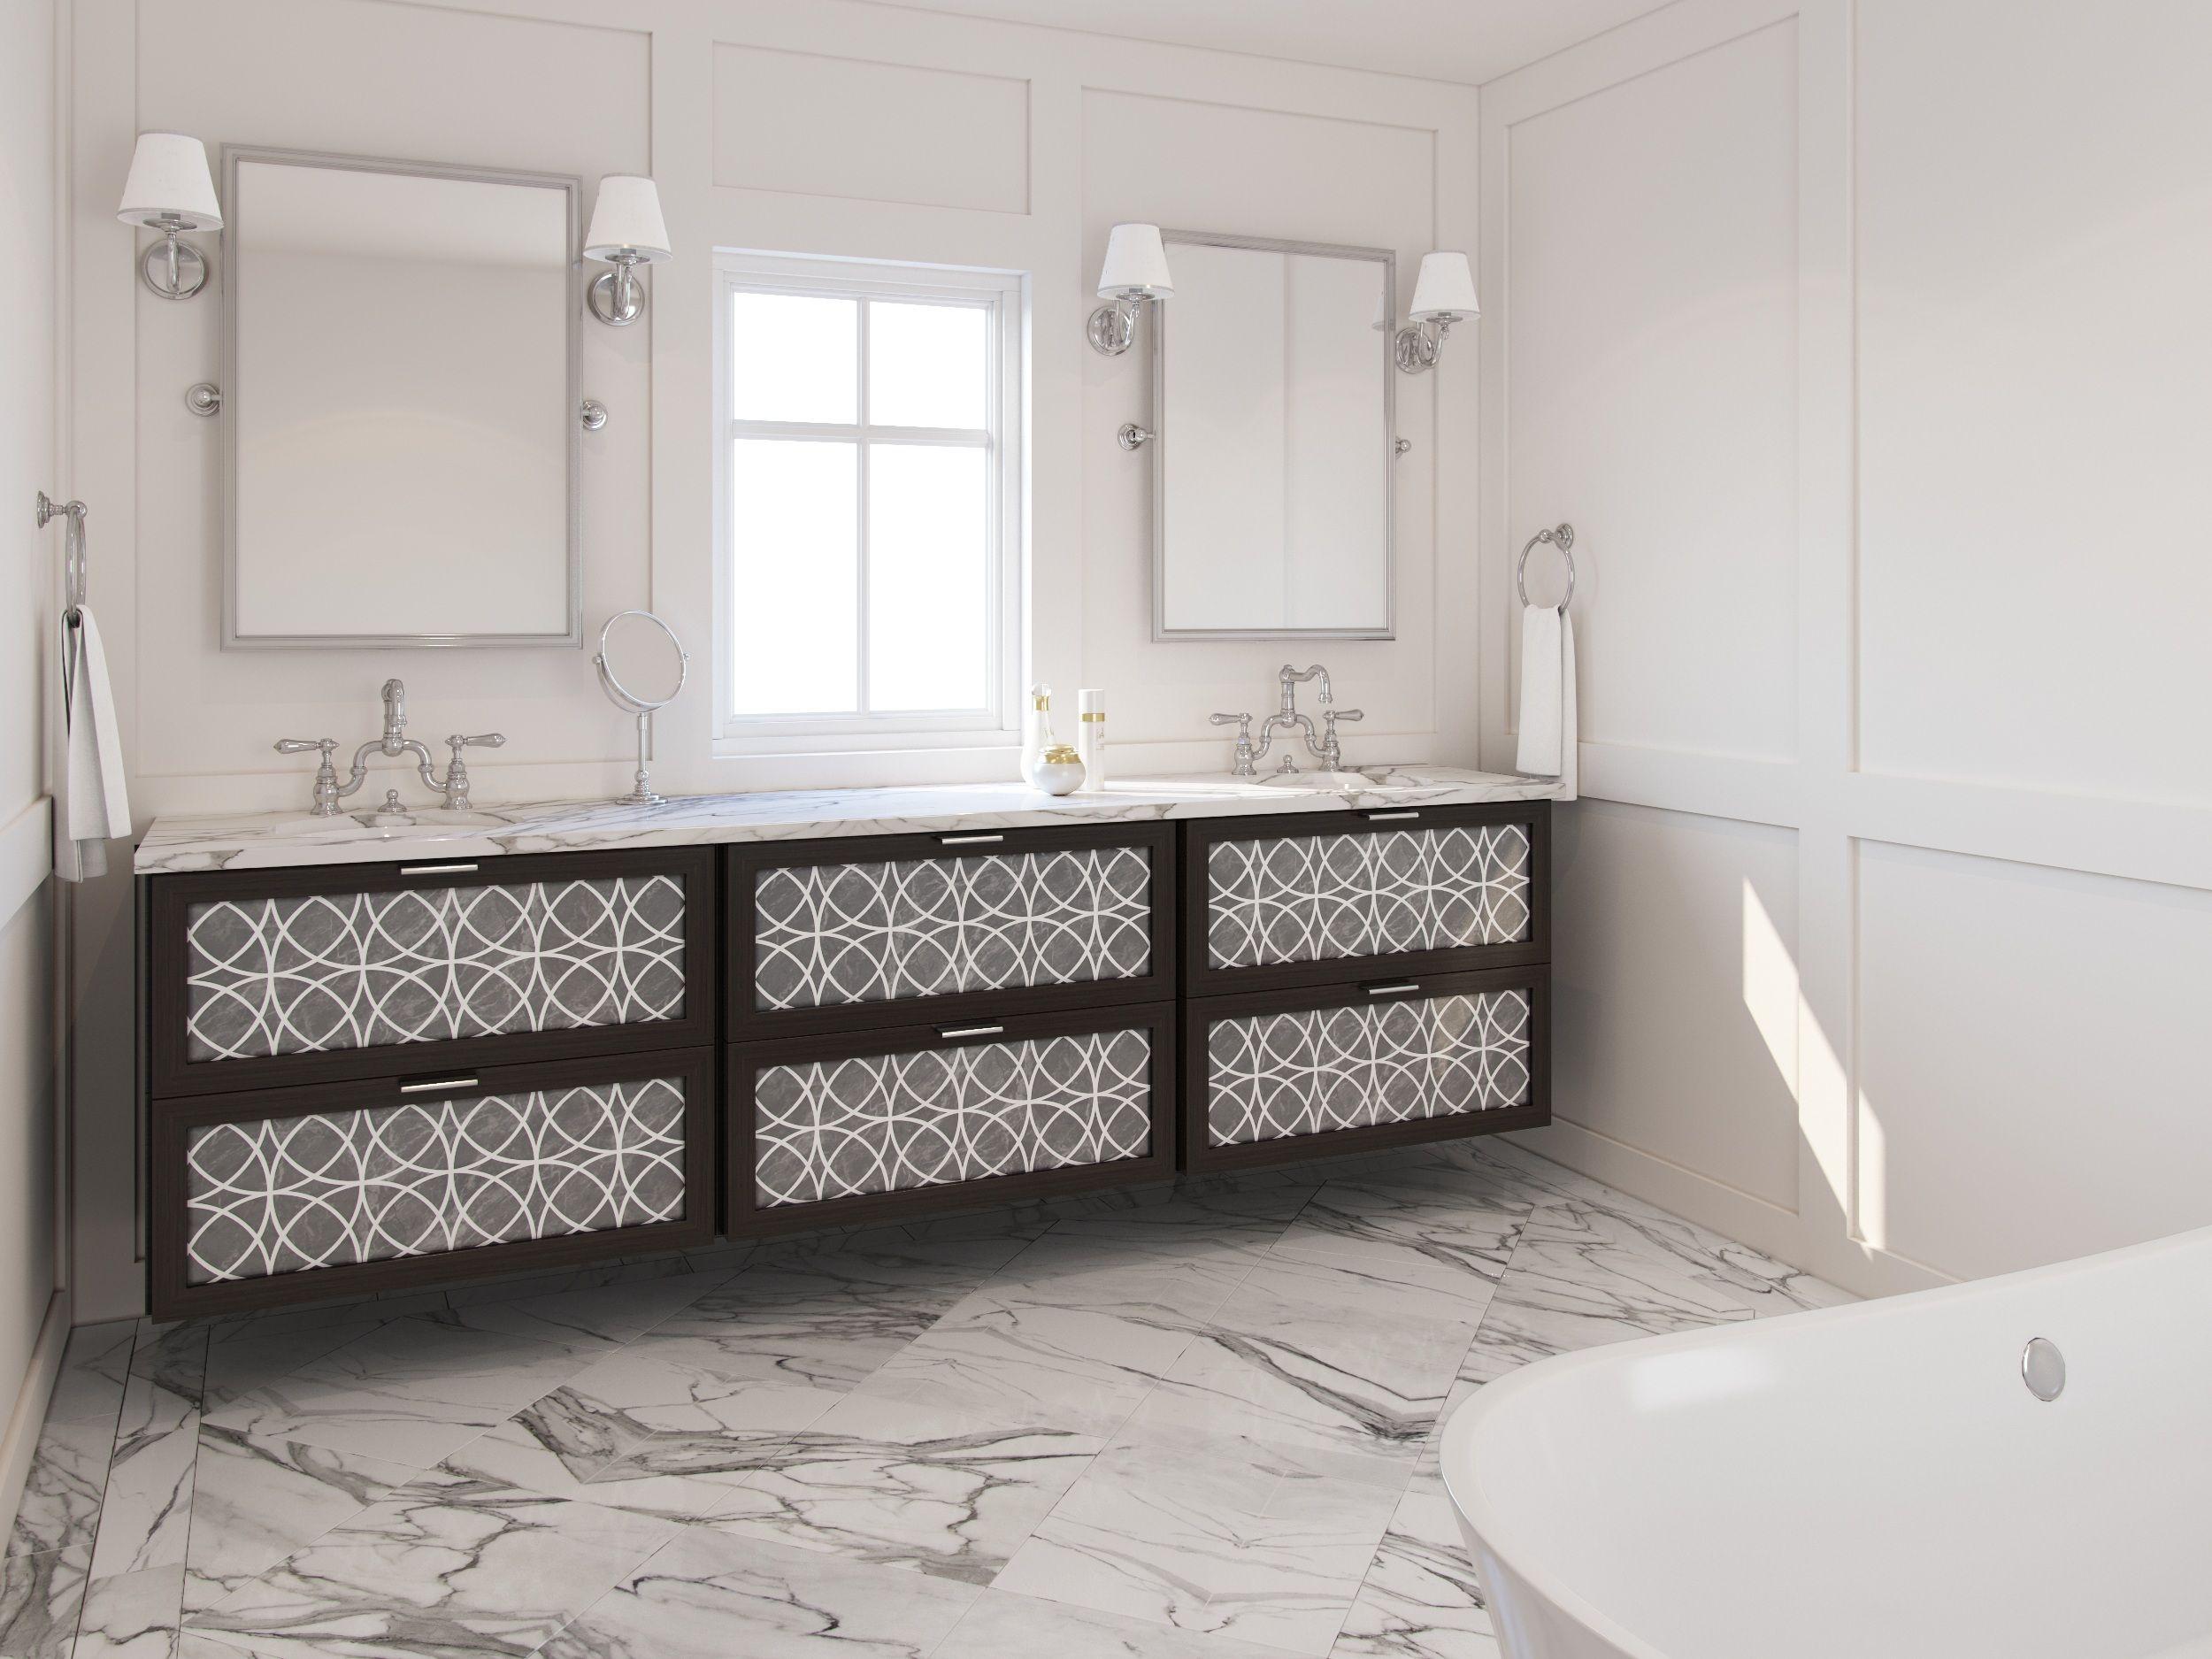 Chameleon Concepts | Bathrooms | Pinterest | Chameleons